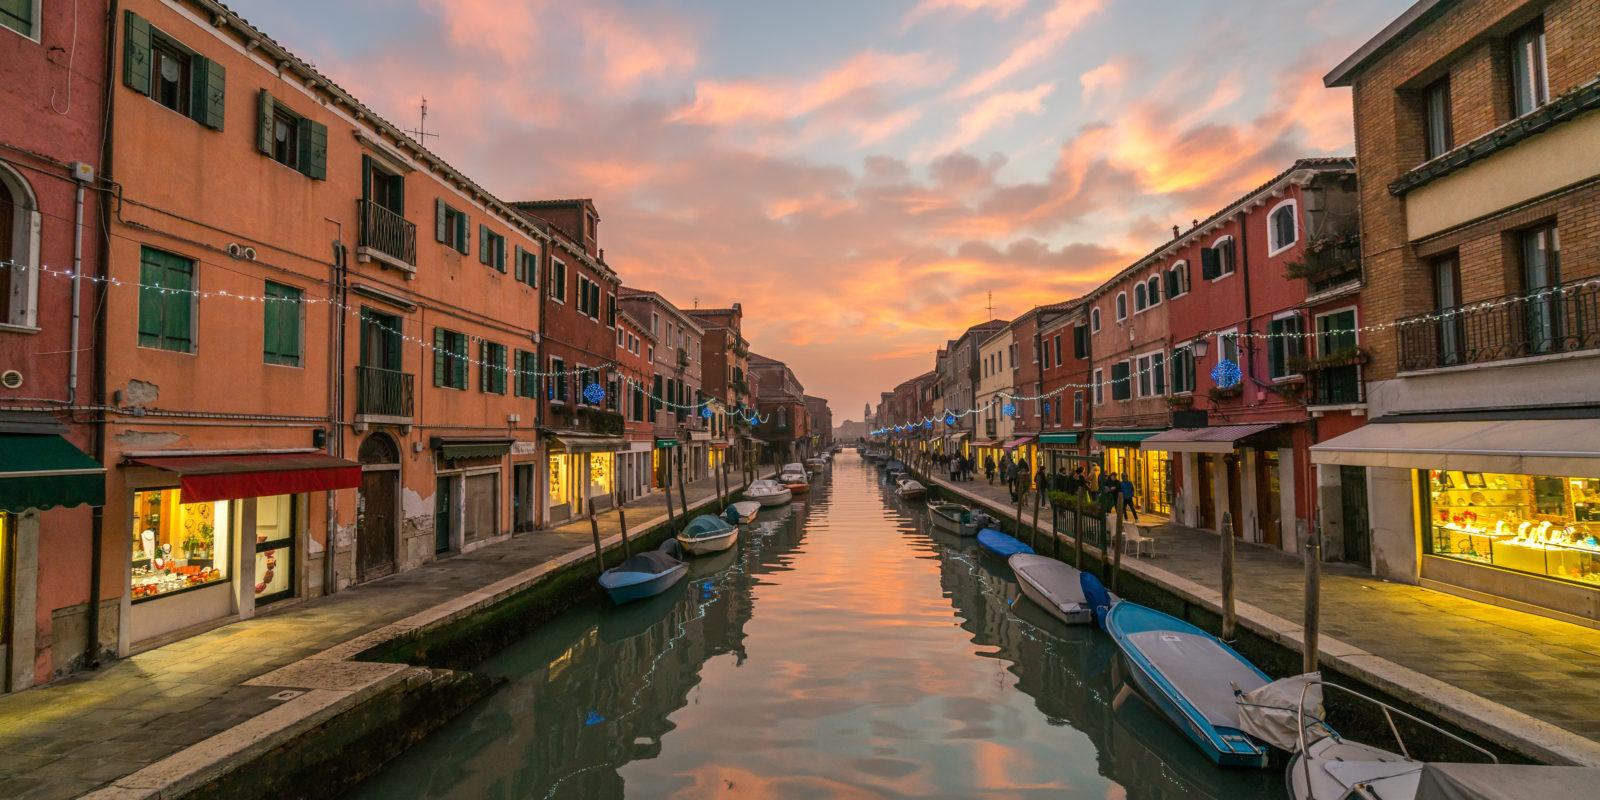 Murano To Burano.Venice Day Trip The Islands Of Murano And Burano